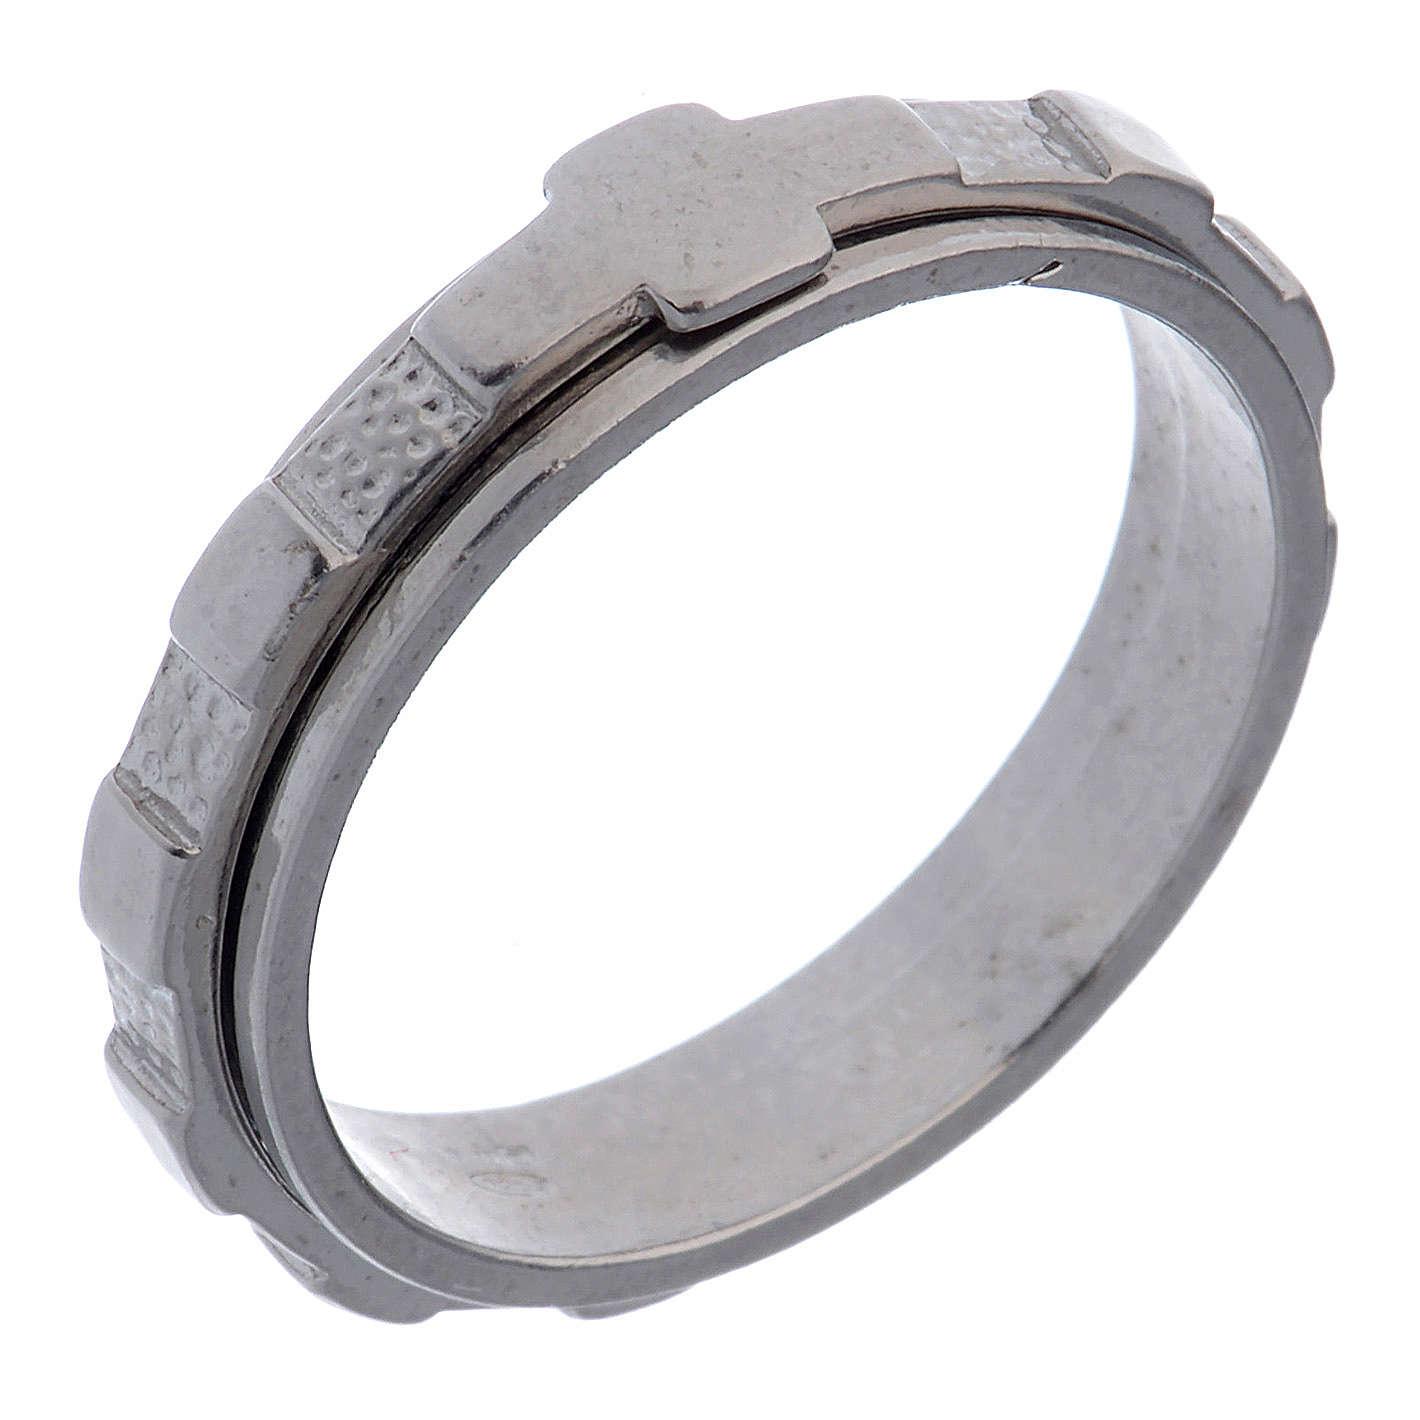 Anel dezena prata 925 giratório 3